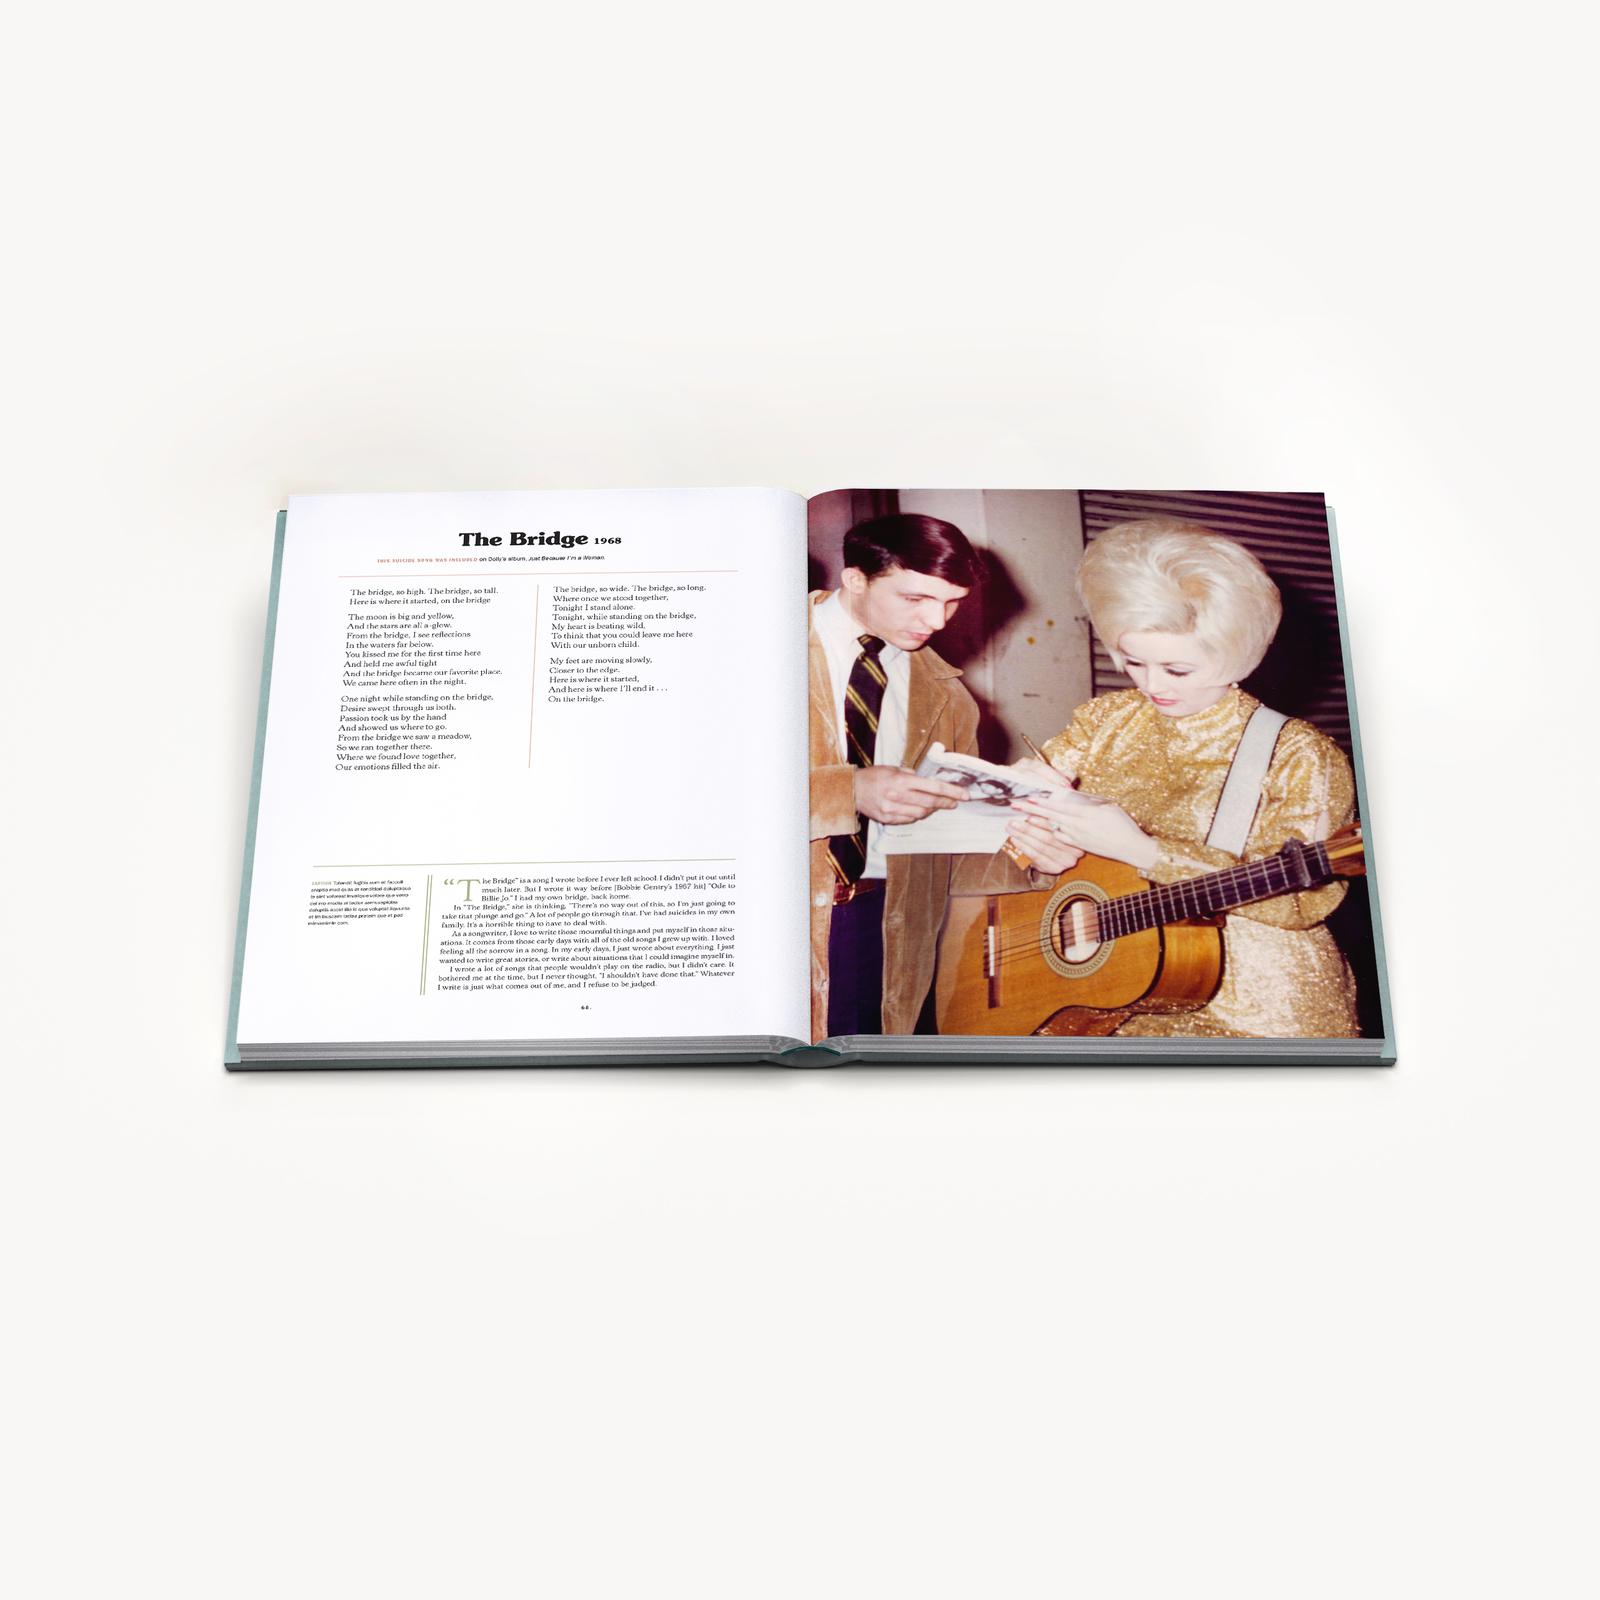 Dolly Parton, Songteller: My Life in Lyrics image